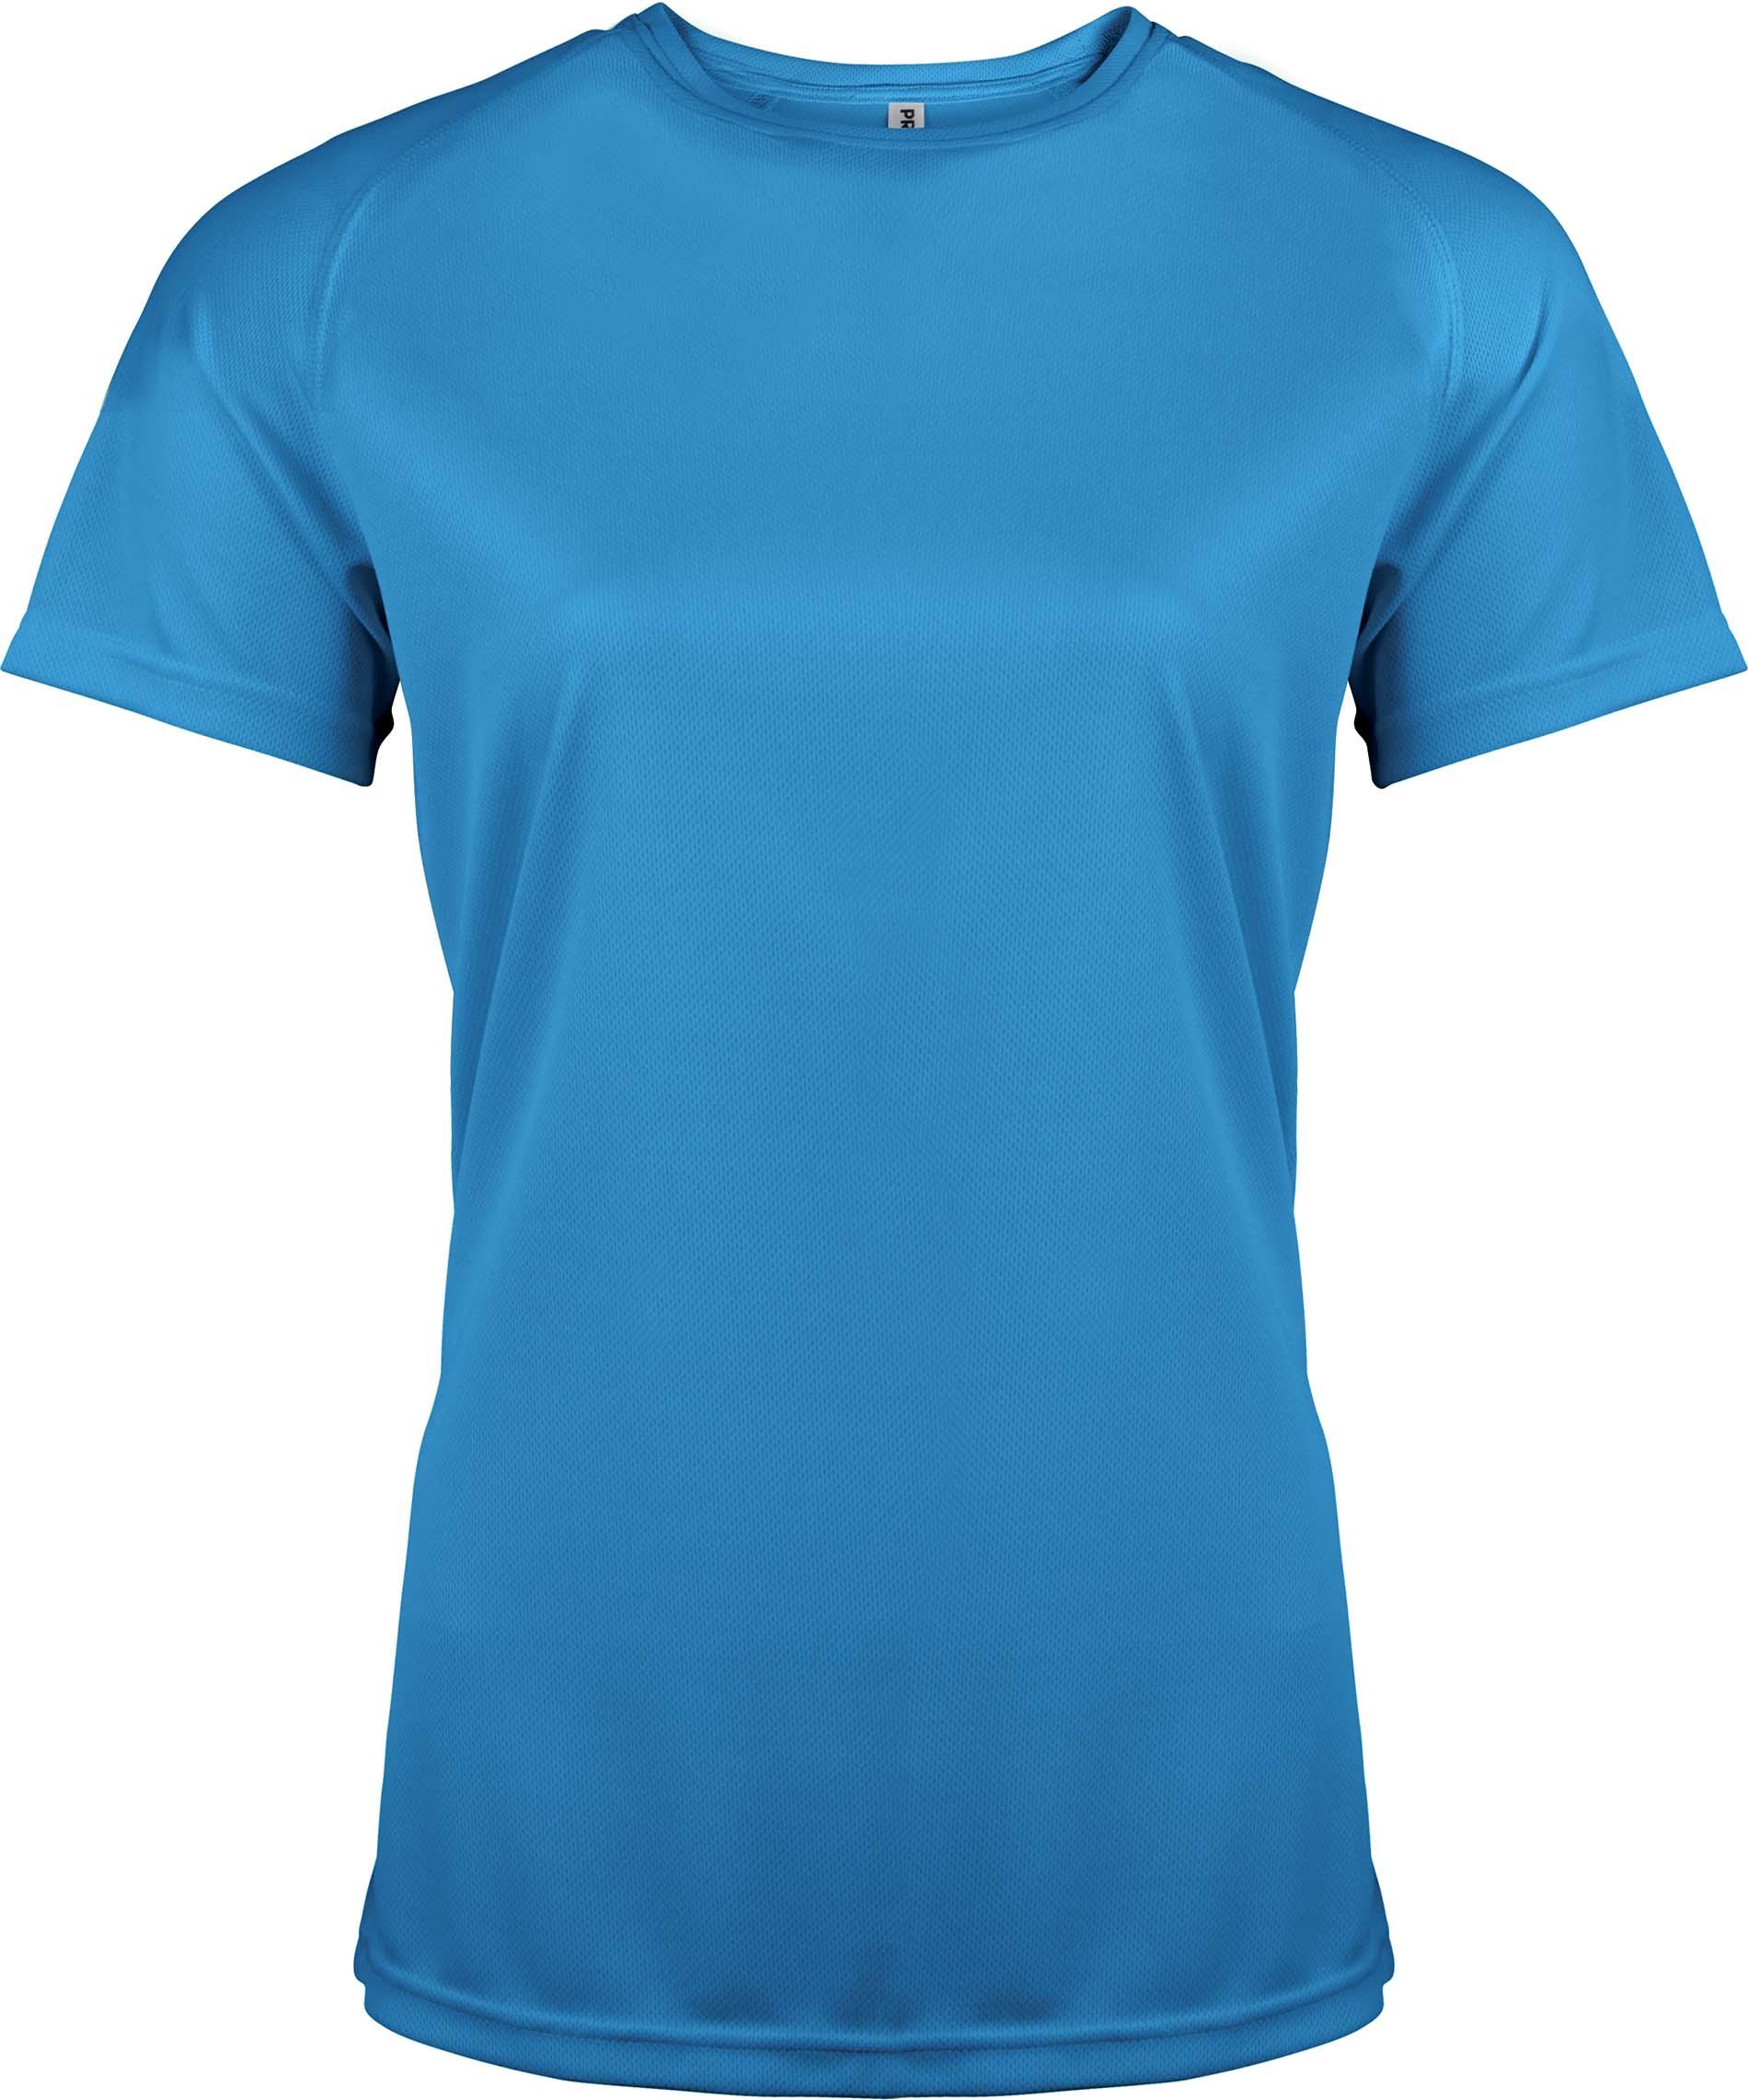 Naisten tekninen T-paita PA439 Aqua